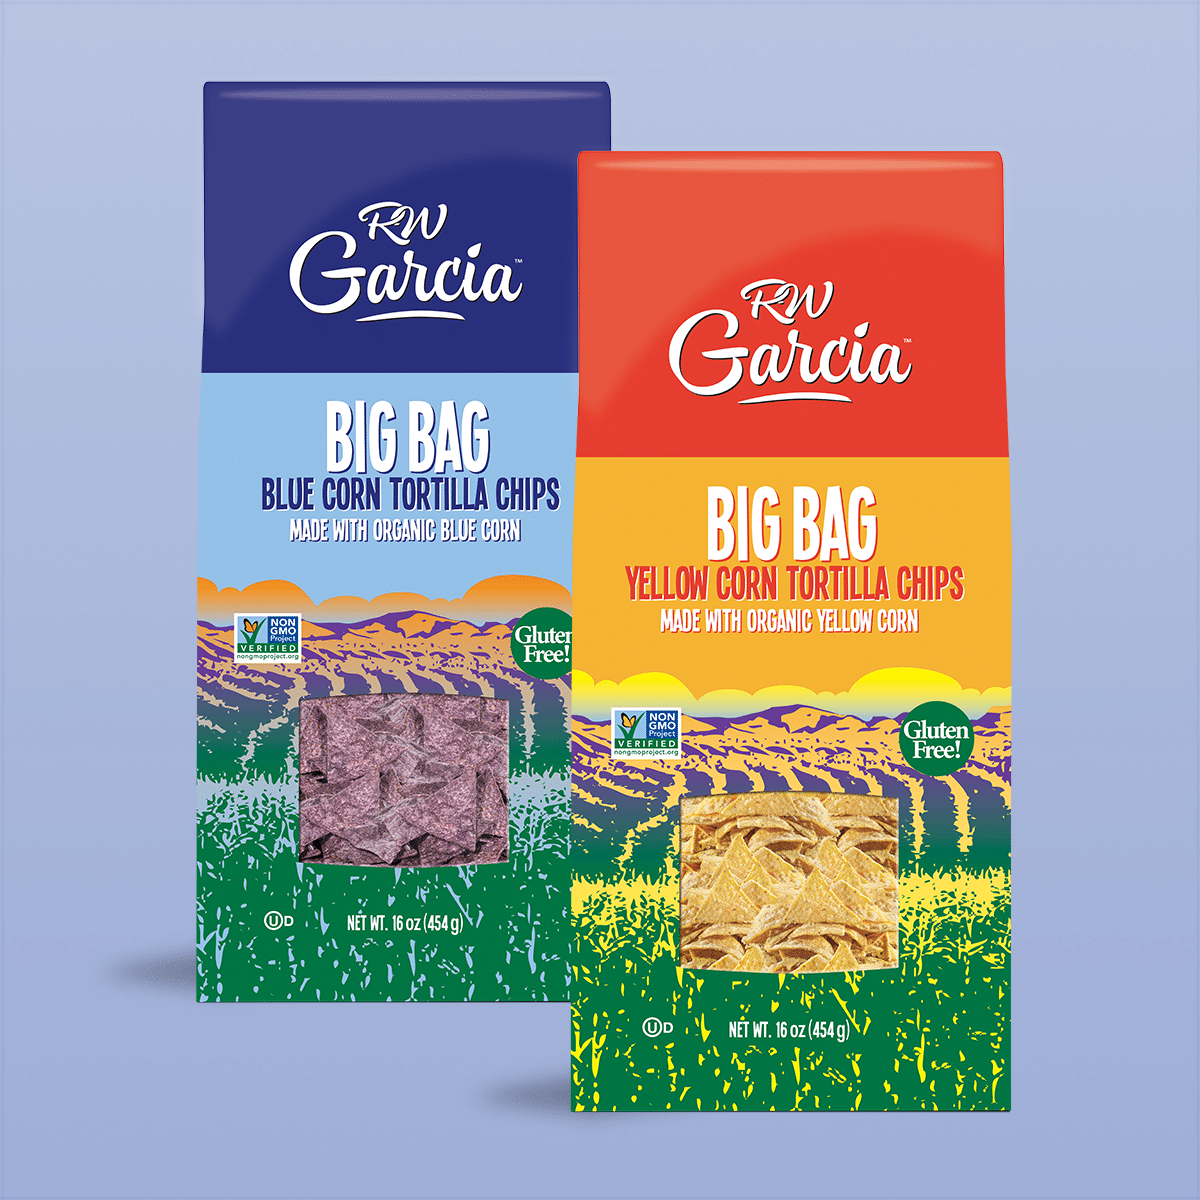 RW Garcia Big Bag Tortilla Chips